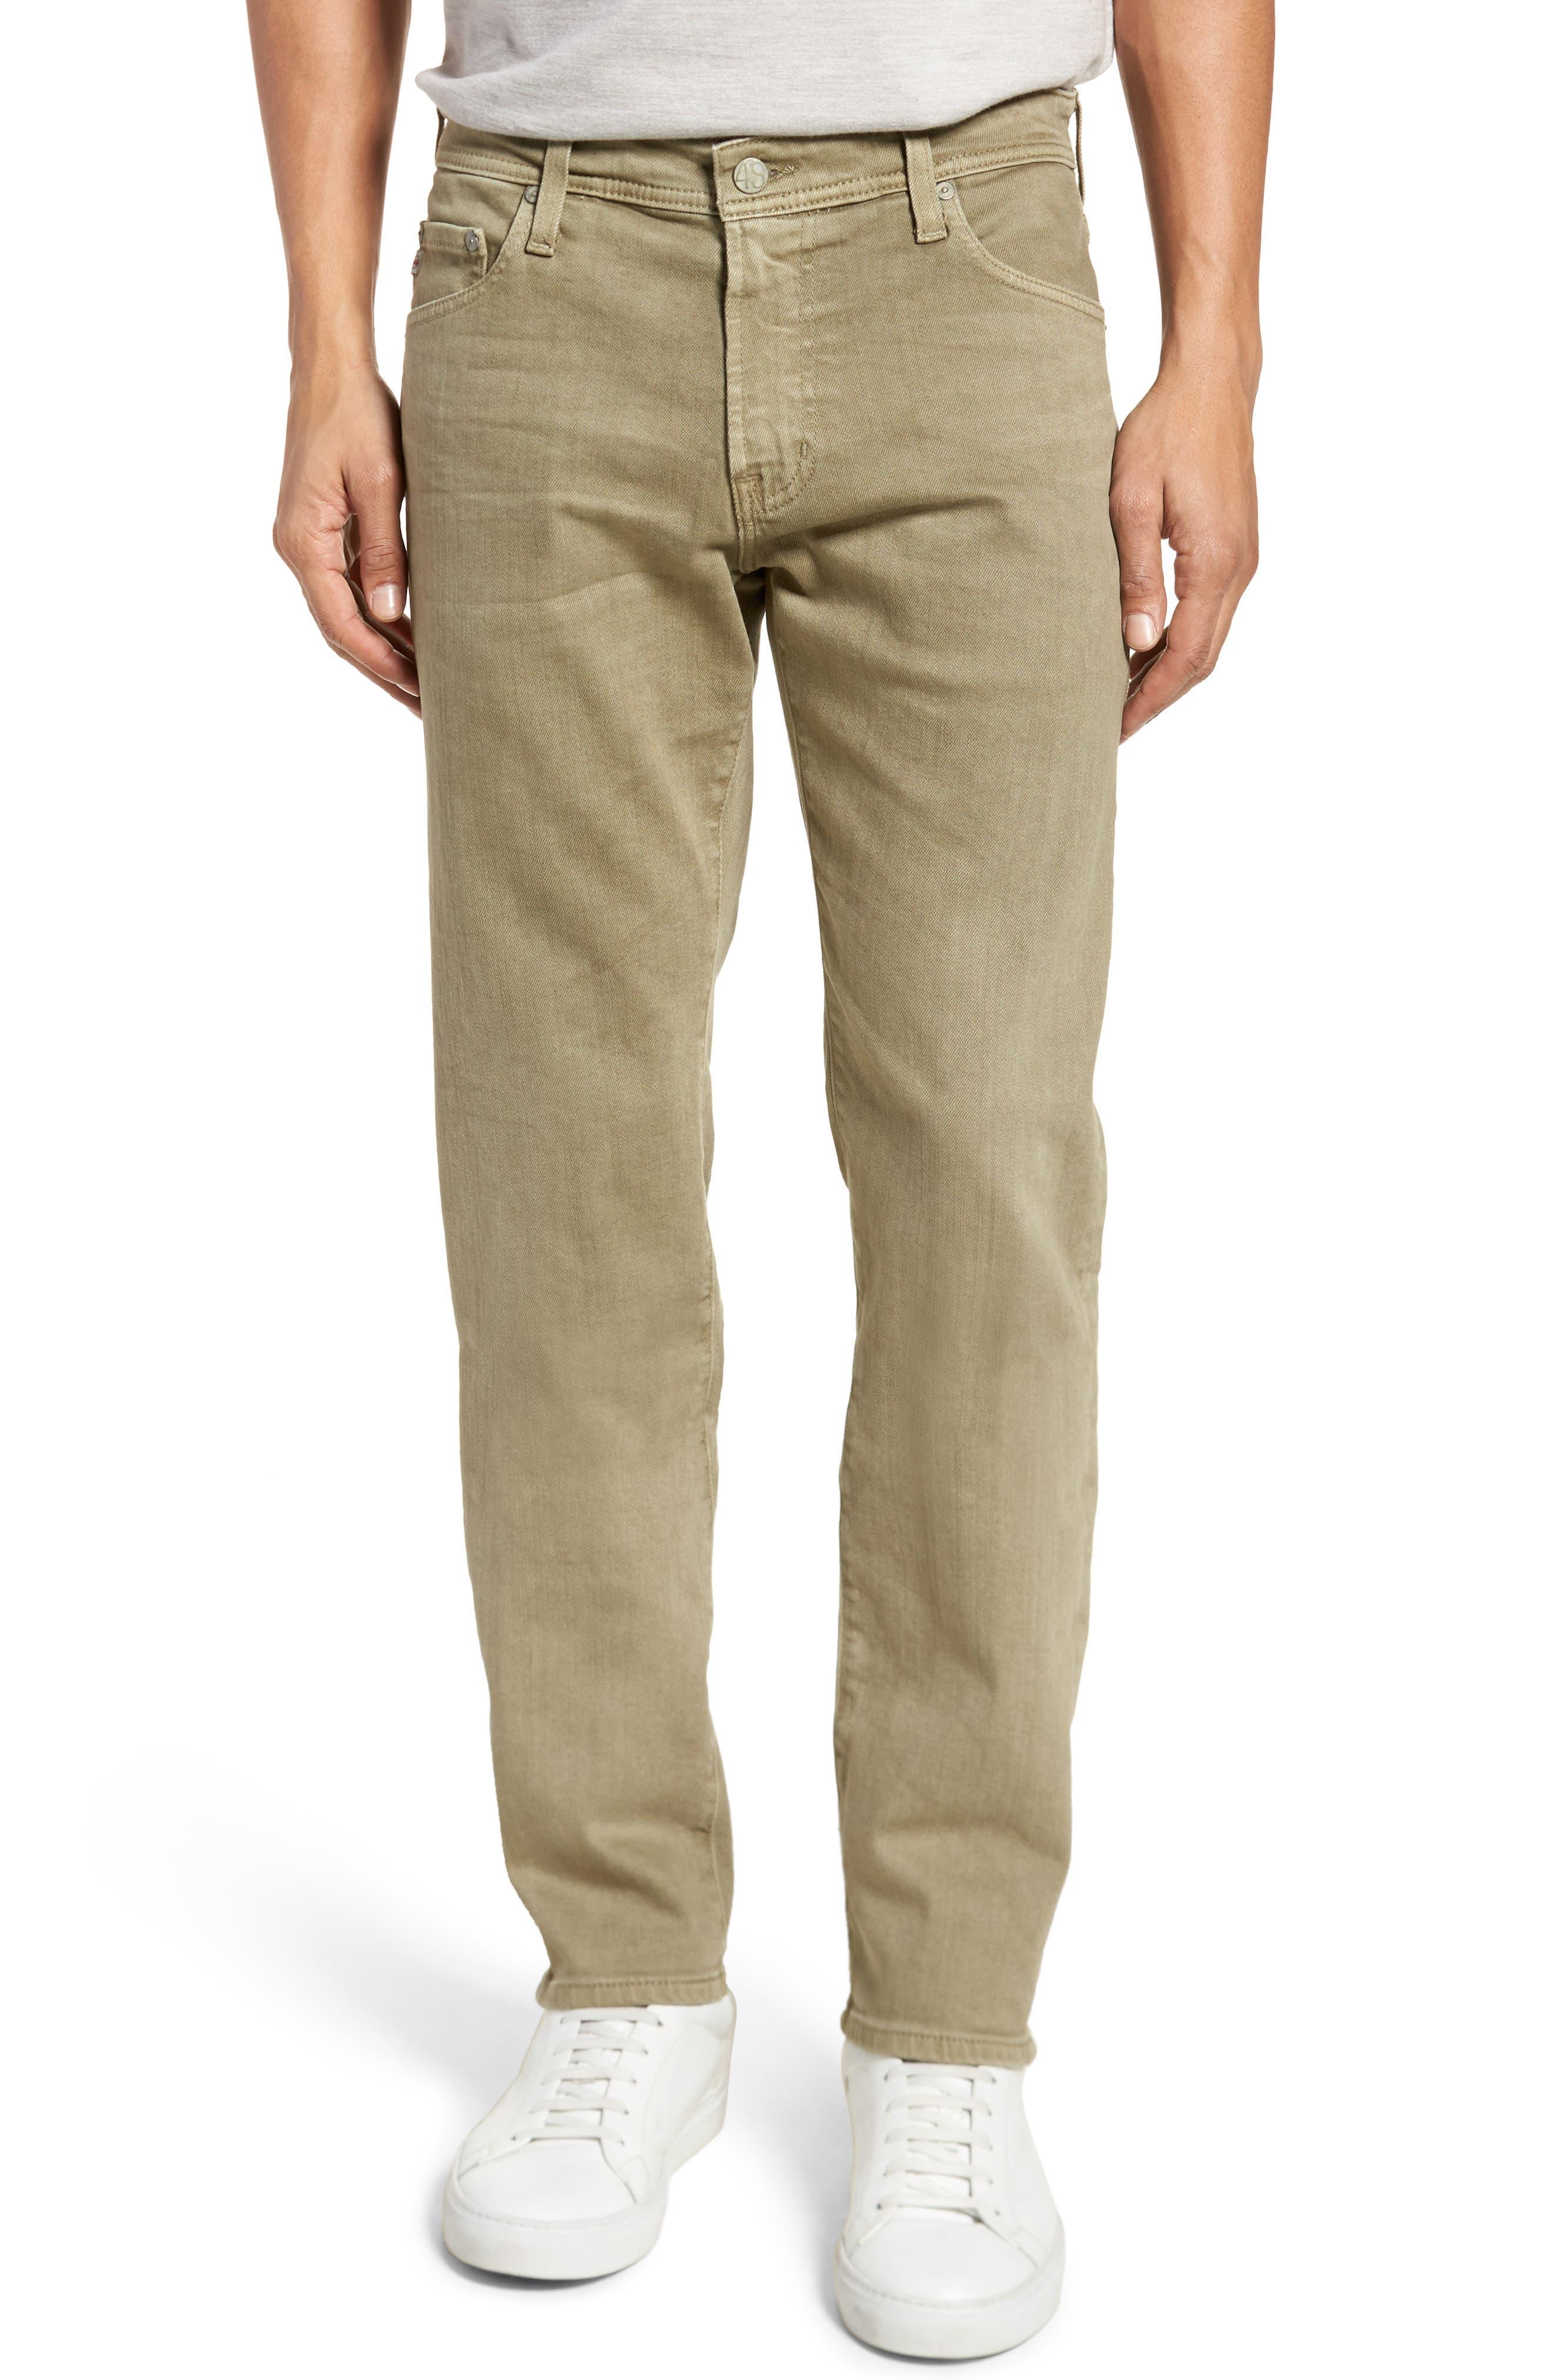 Tellis Slim Fit Jeans,                         Main,                         color, 7 Years Dry Cypress